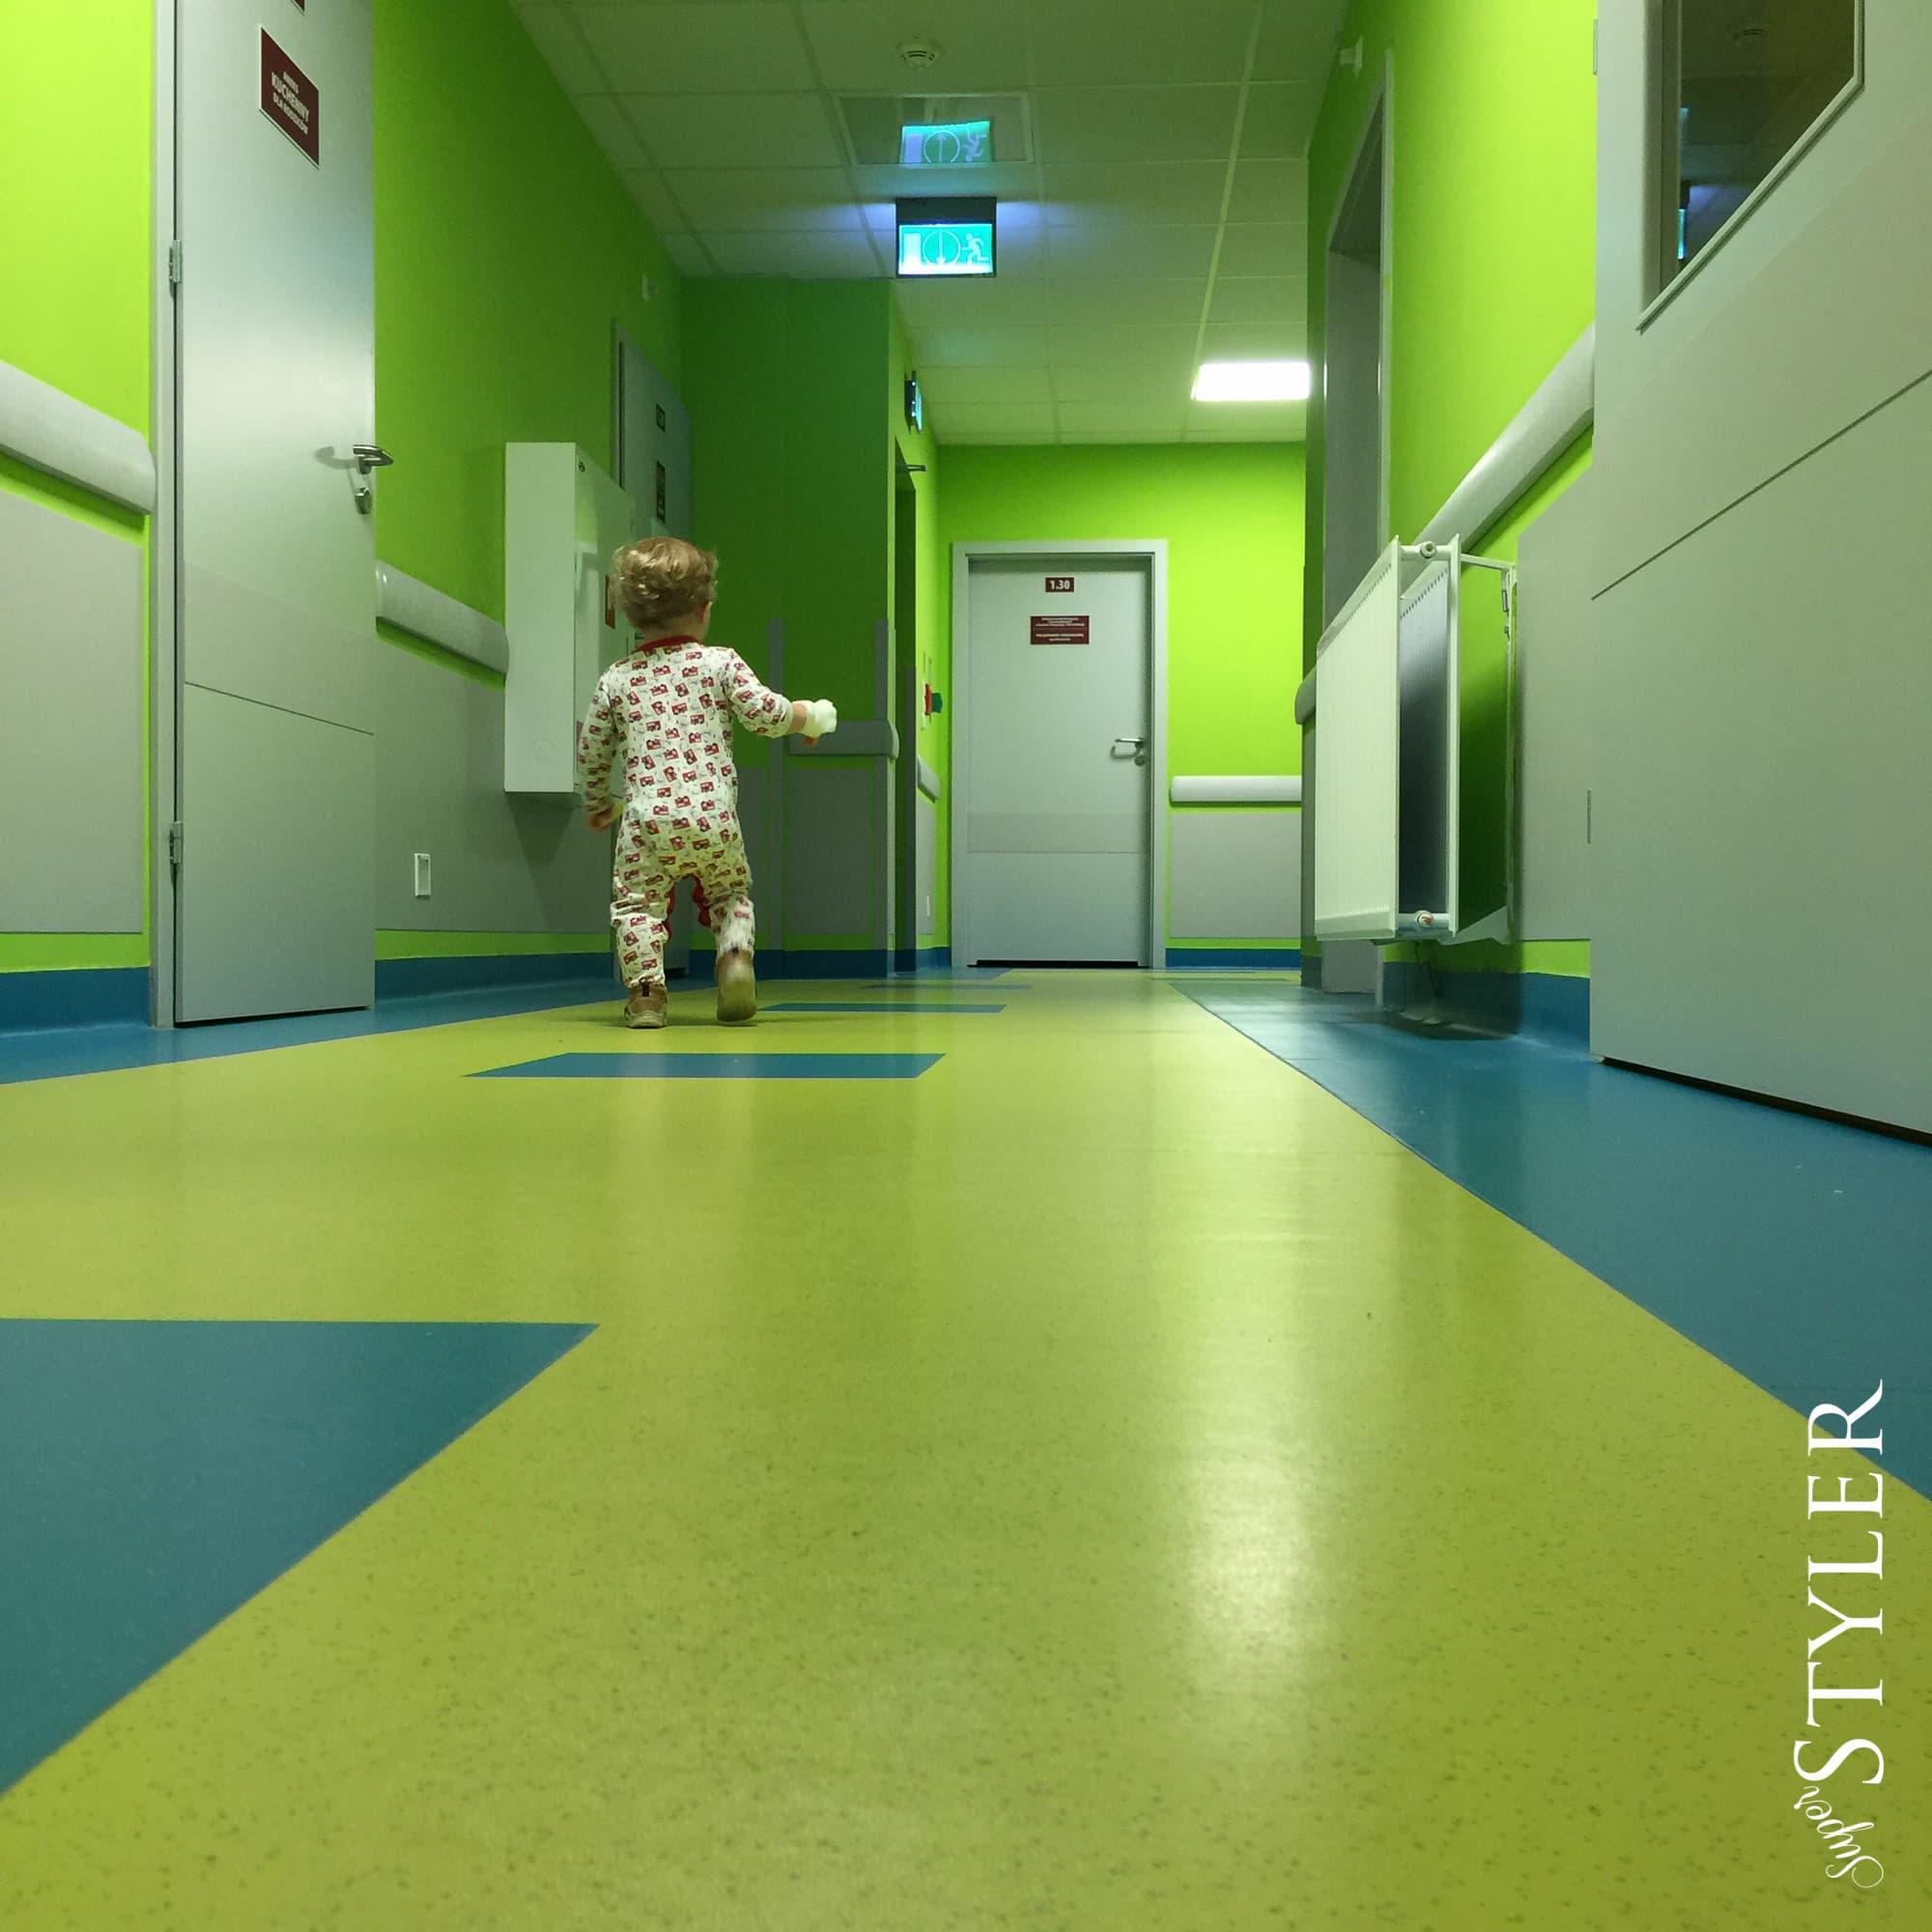 szpitalne matki